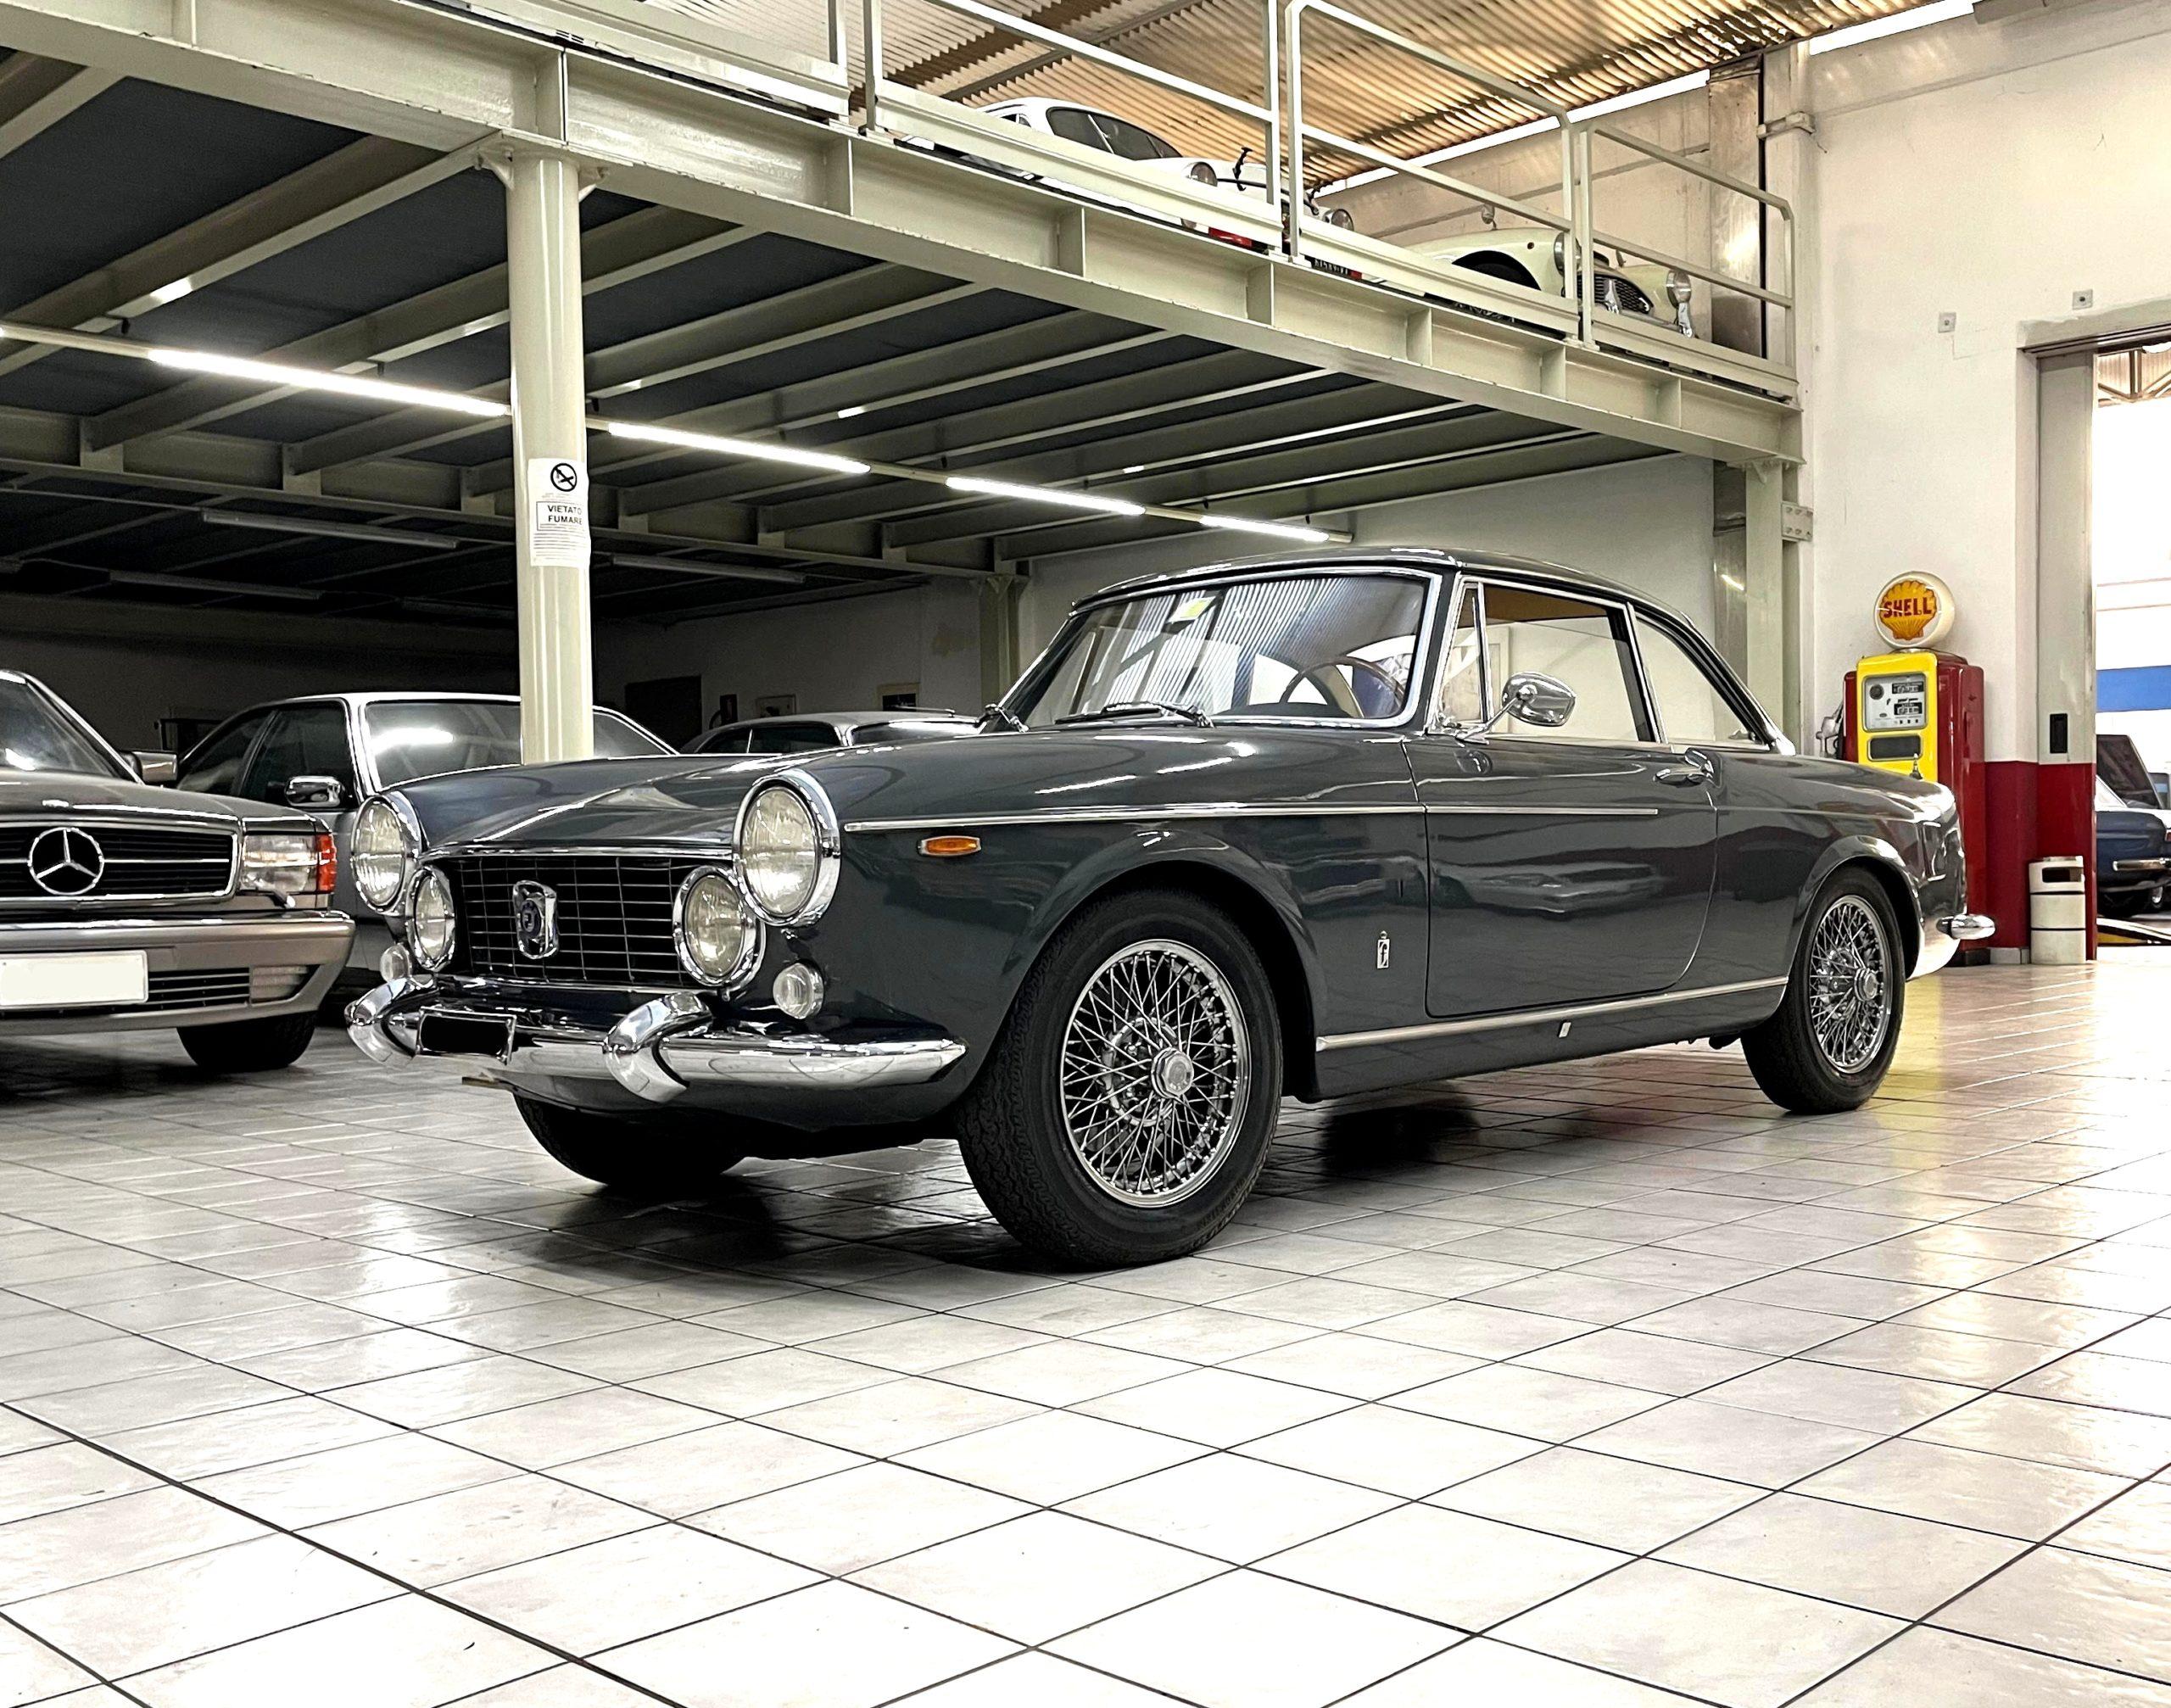 OSCA 1600 S Rare Classic car for sale BEST AUTO SASSUOLO